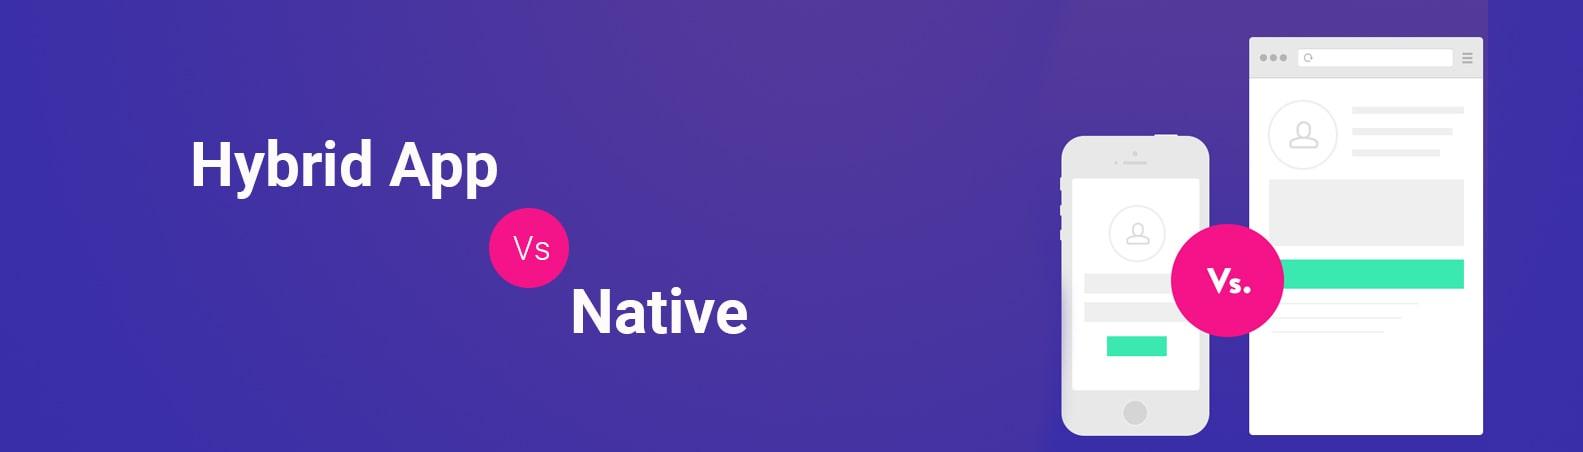 Hybrid App Vs Native – Which is good? – Hybrid or Native App